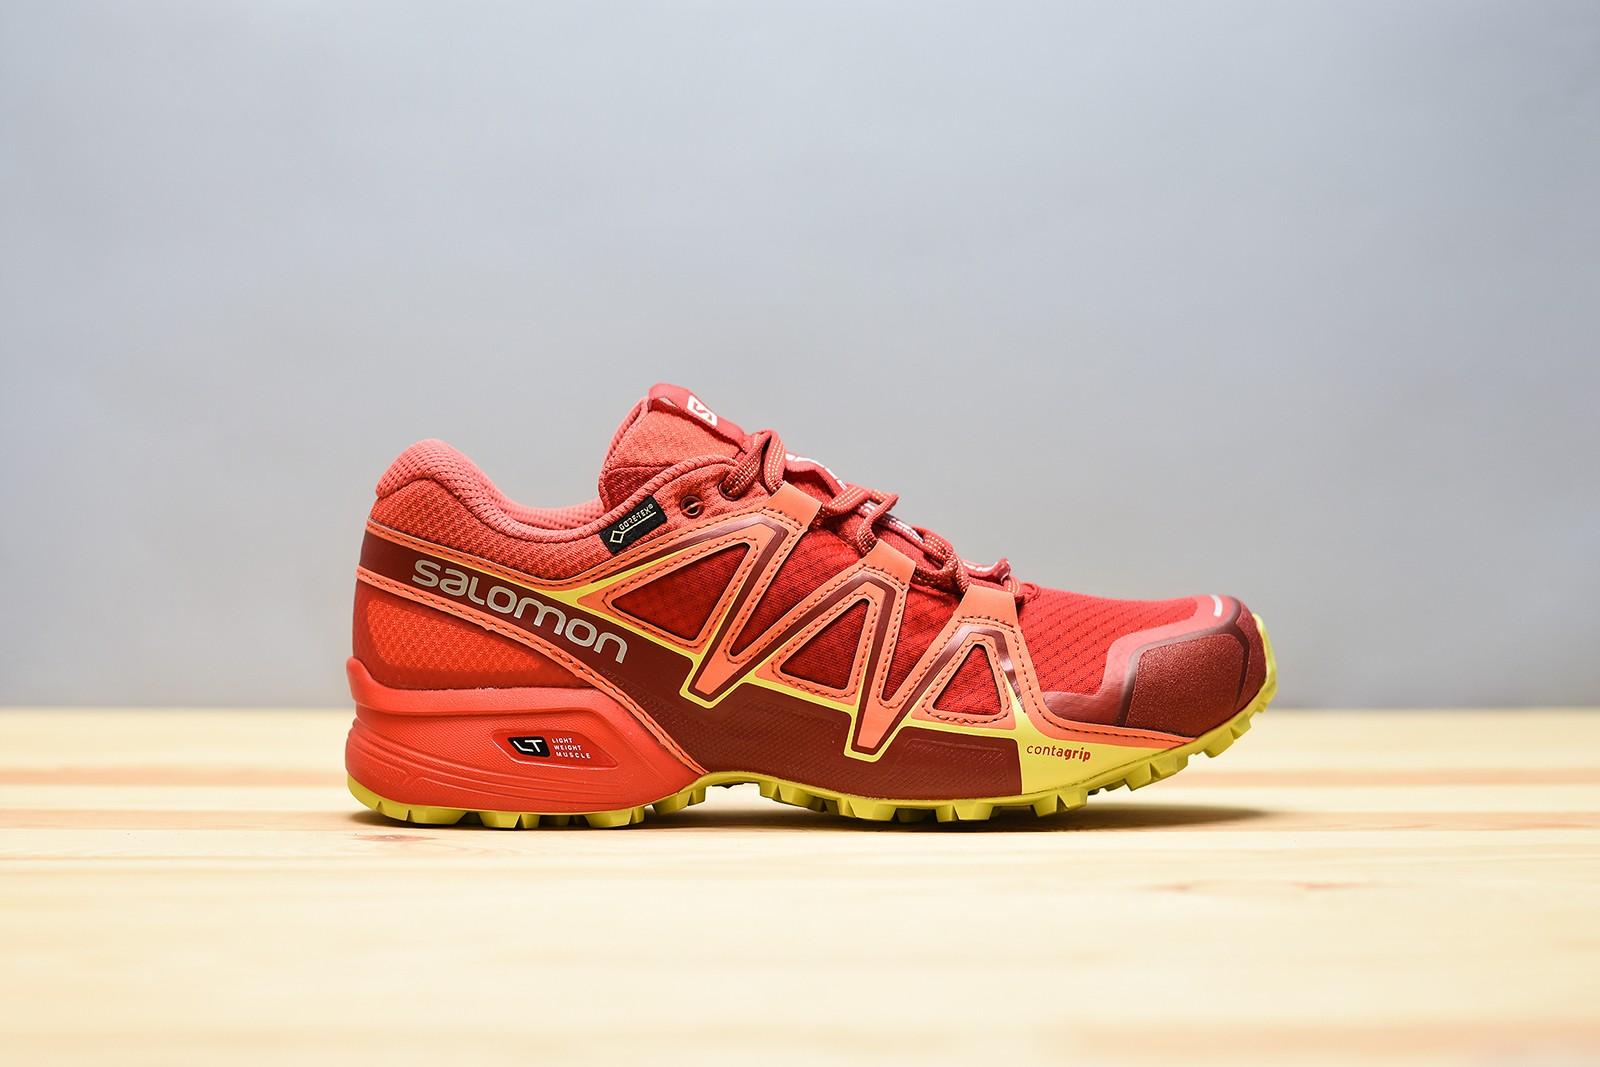 Dámské Běžecké boty Salomon SPEEDCROSS VARIO 2 GTXR W Barb  f19c8fc038